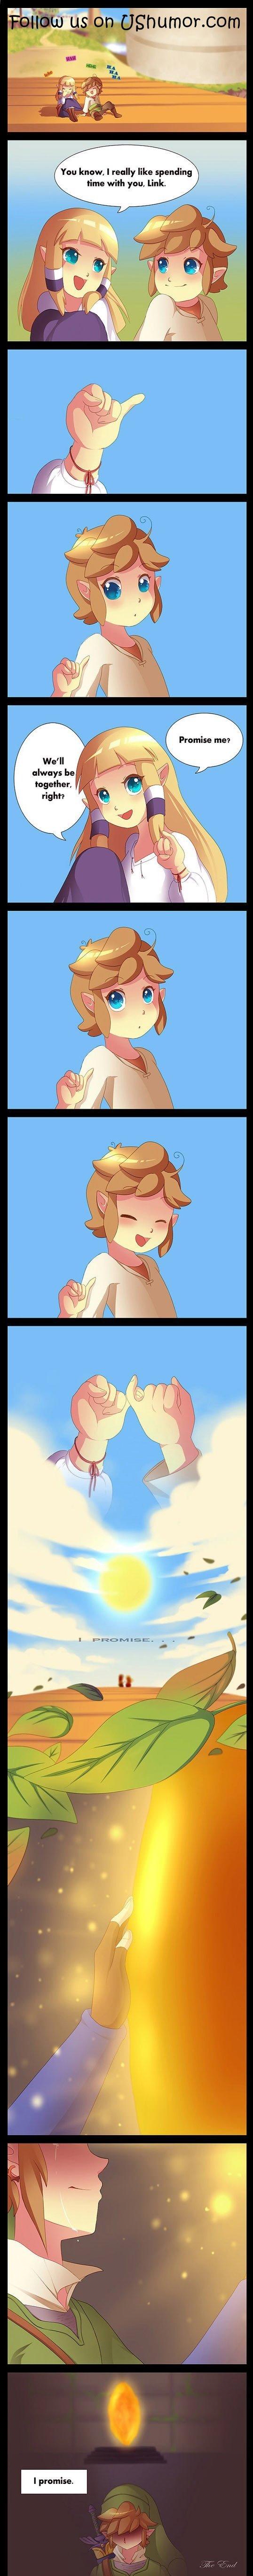 A promise is a promise…. A promise is a promise… .. Not sure if repost 9lols